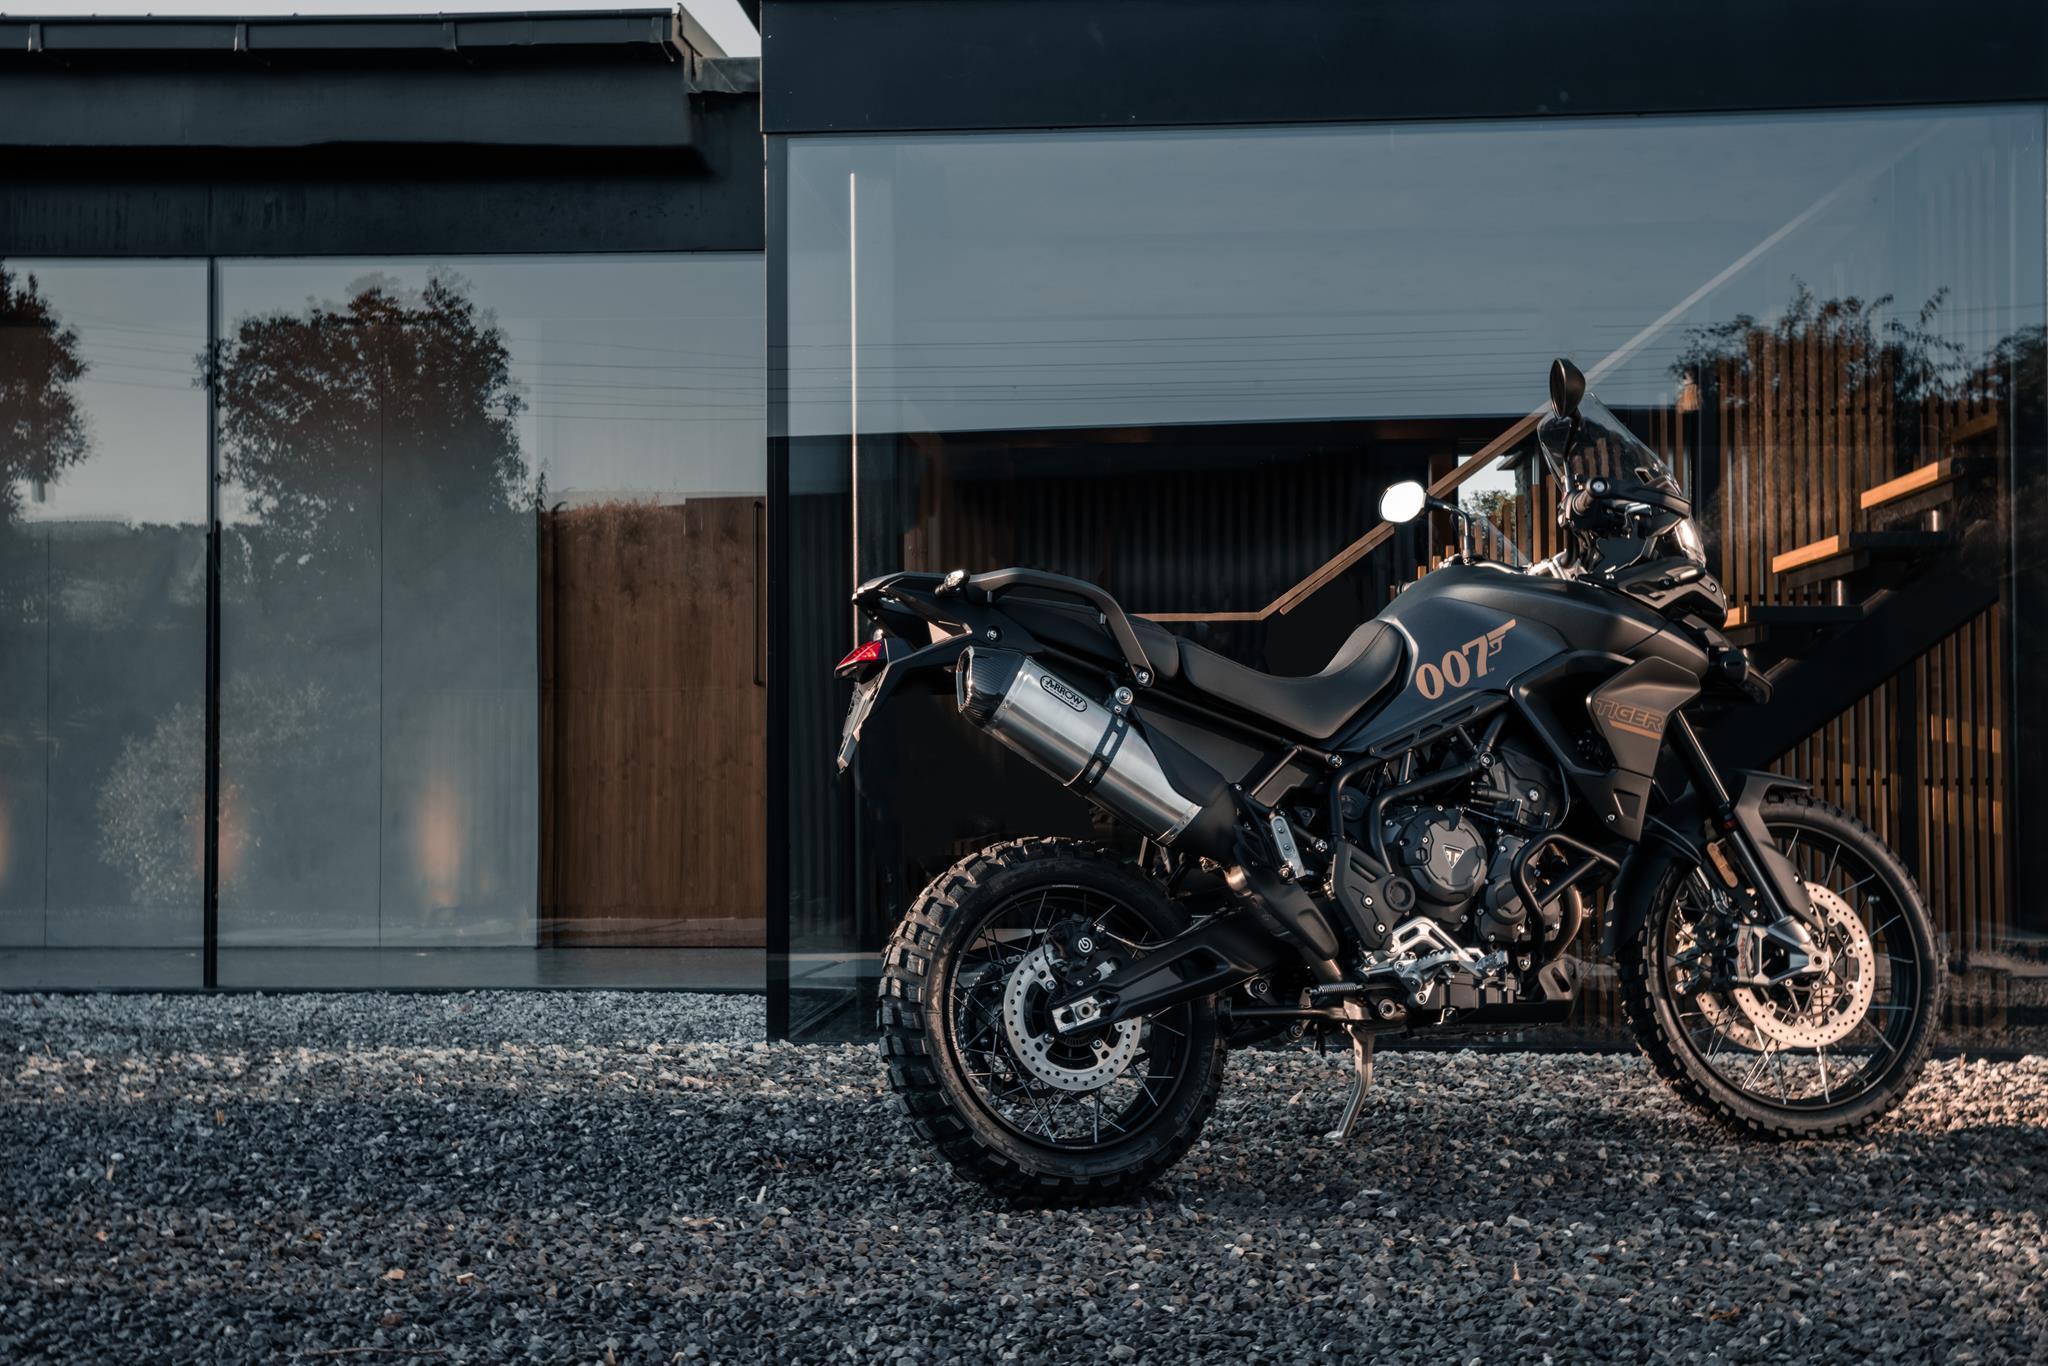 triumph motorcycles per james bond film